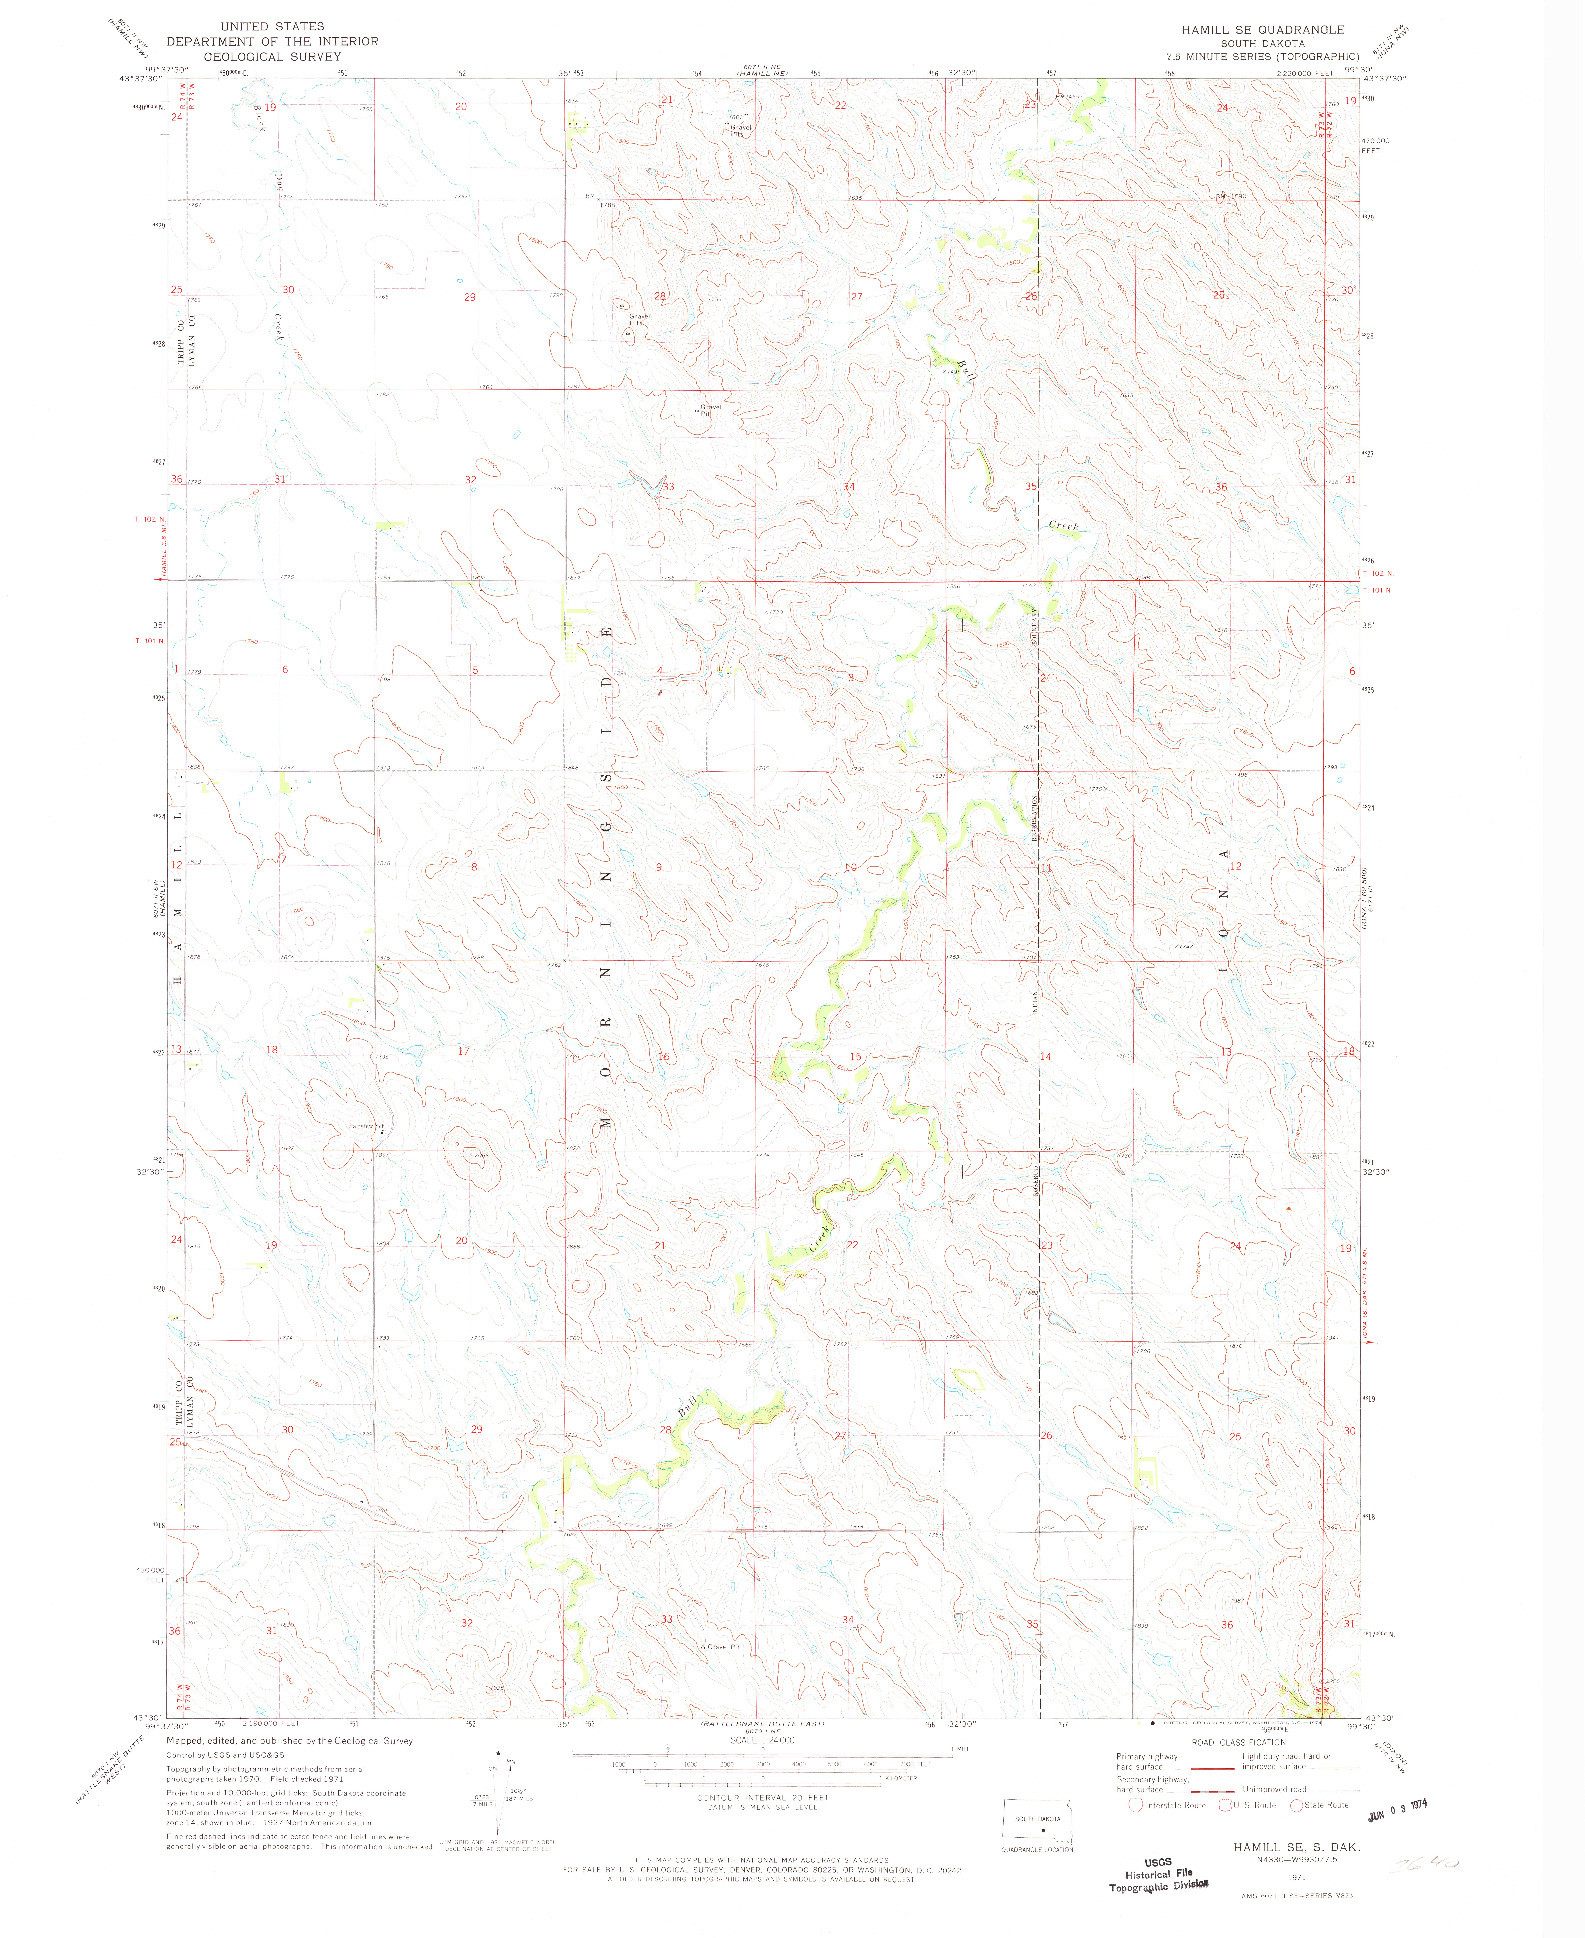 USGS 1:24000-SCALE QUADRANGLE FOR HAMILL SE, SD 1971